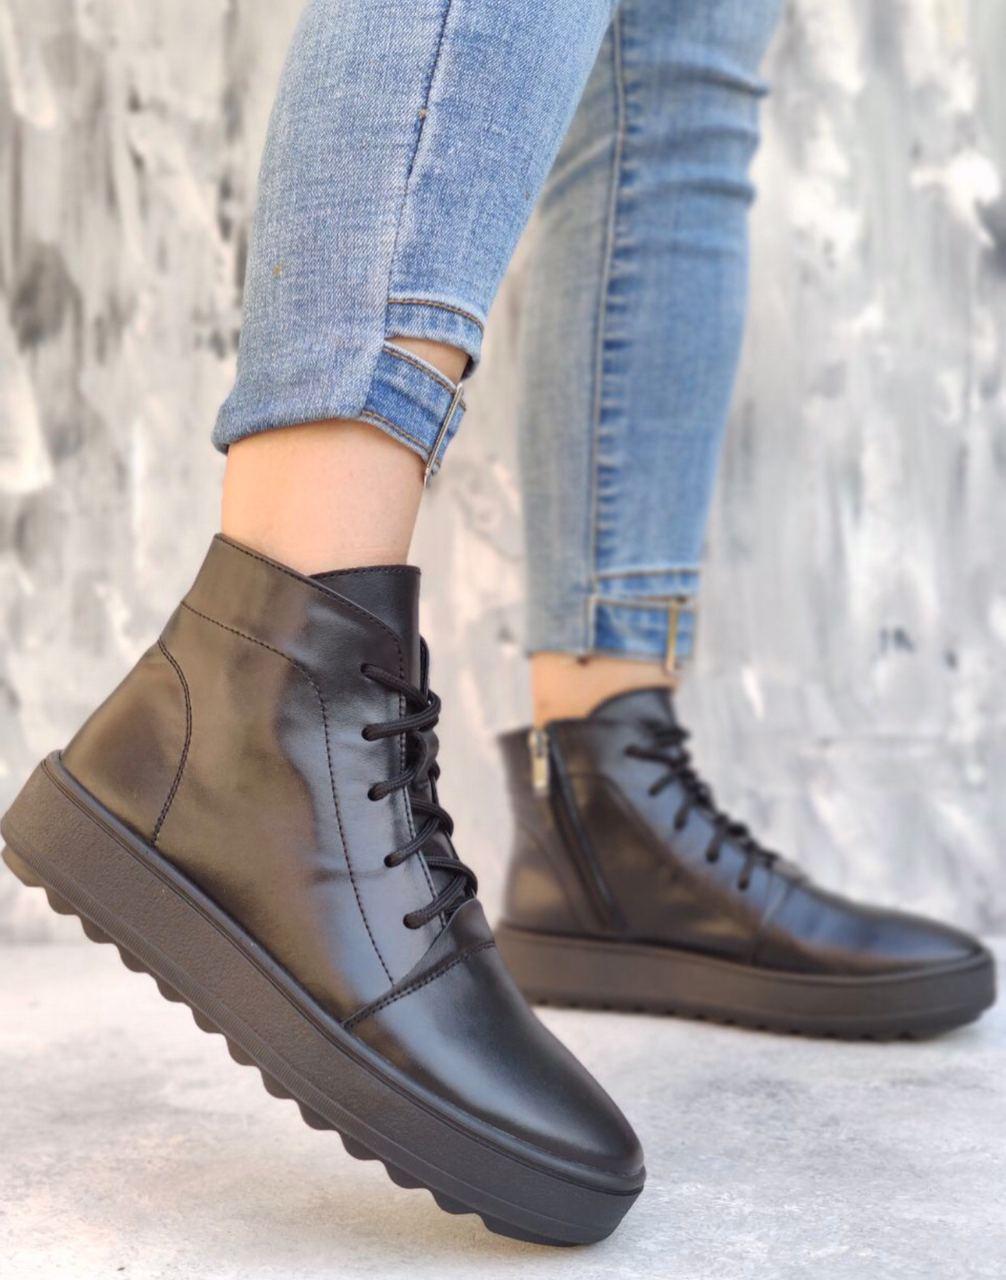 ботики на платформе, ботинки с молнией и шнуровкой